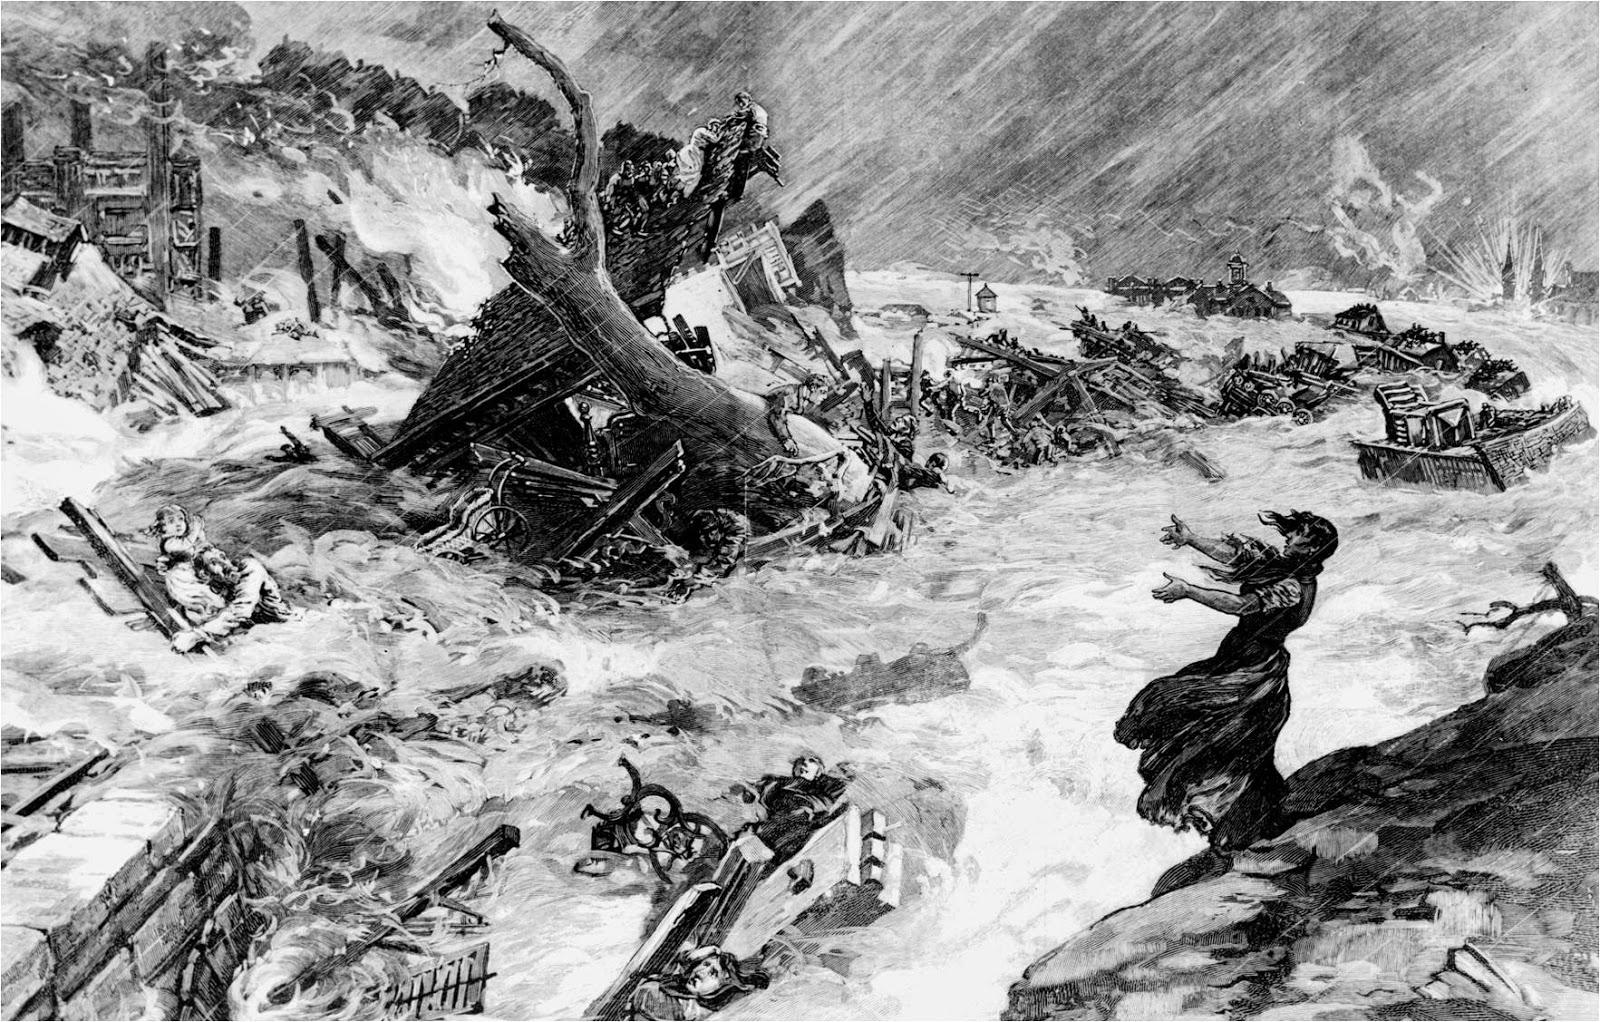 Drawn tornado calamity Akin Our churning Calamity': than